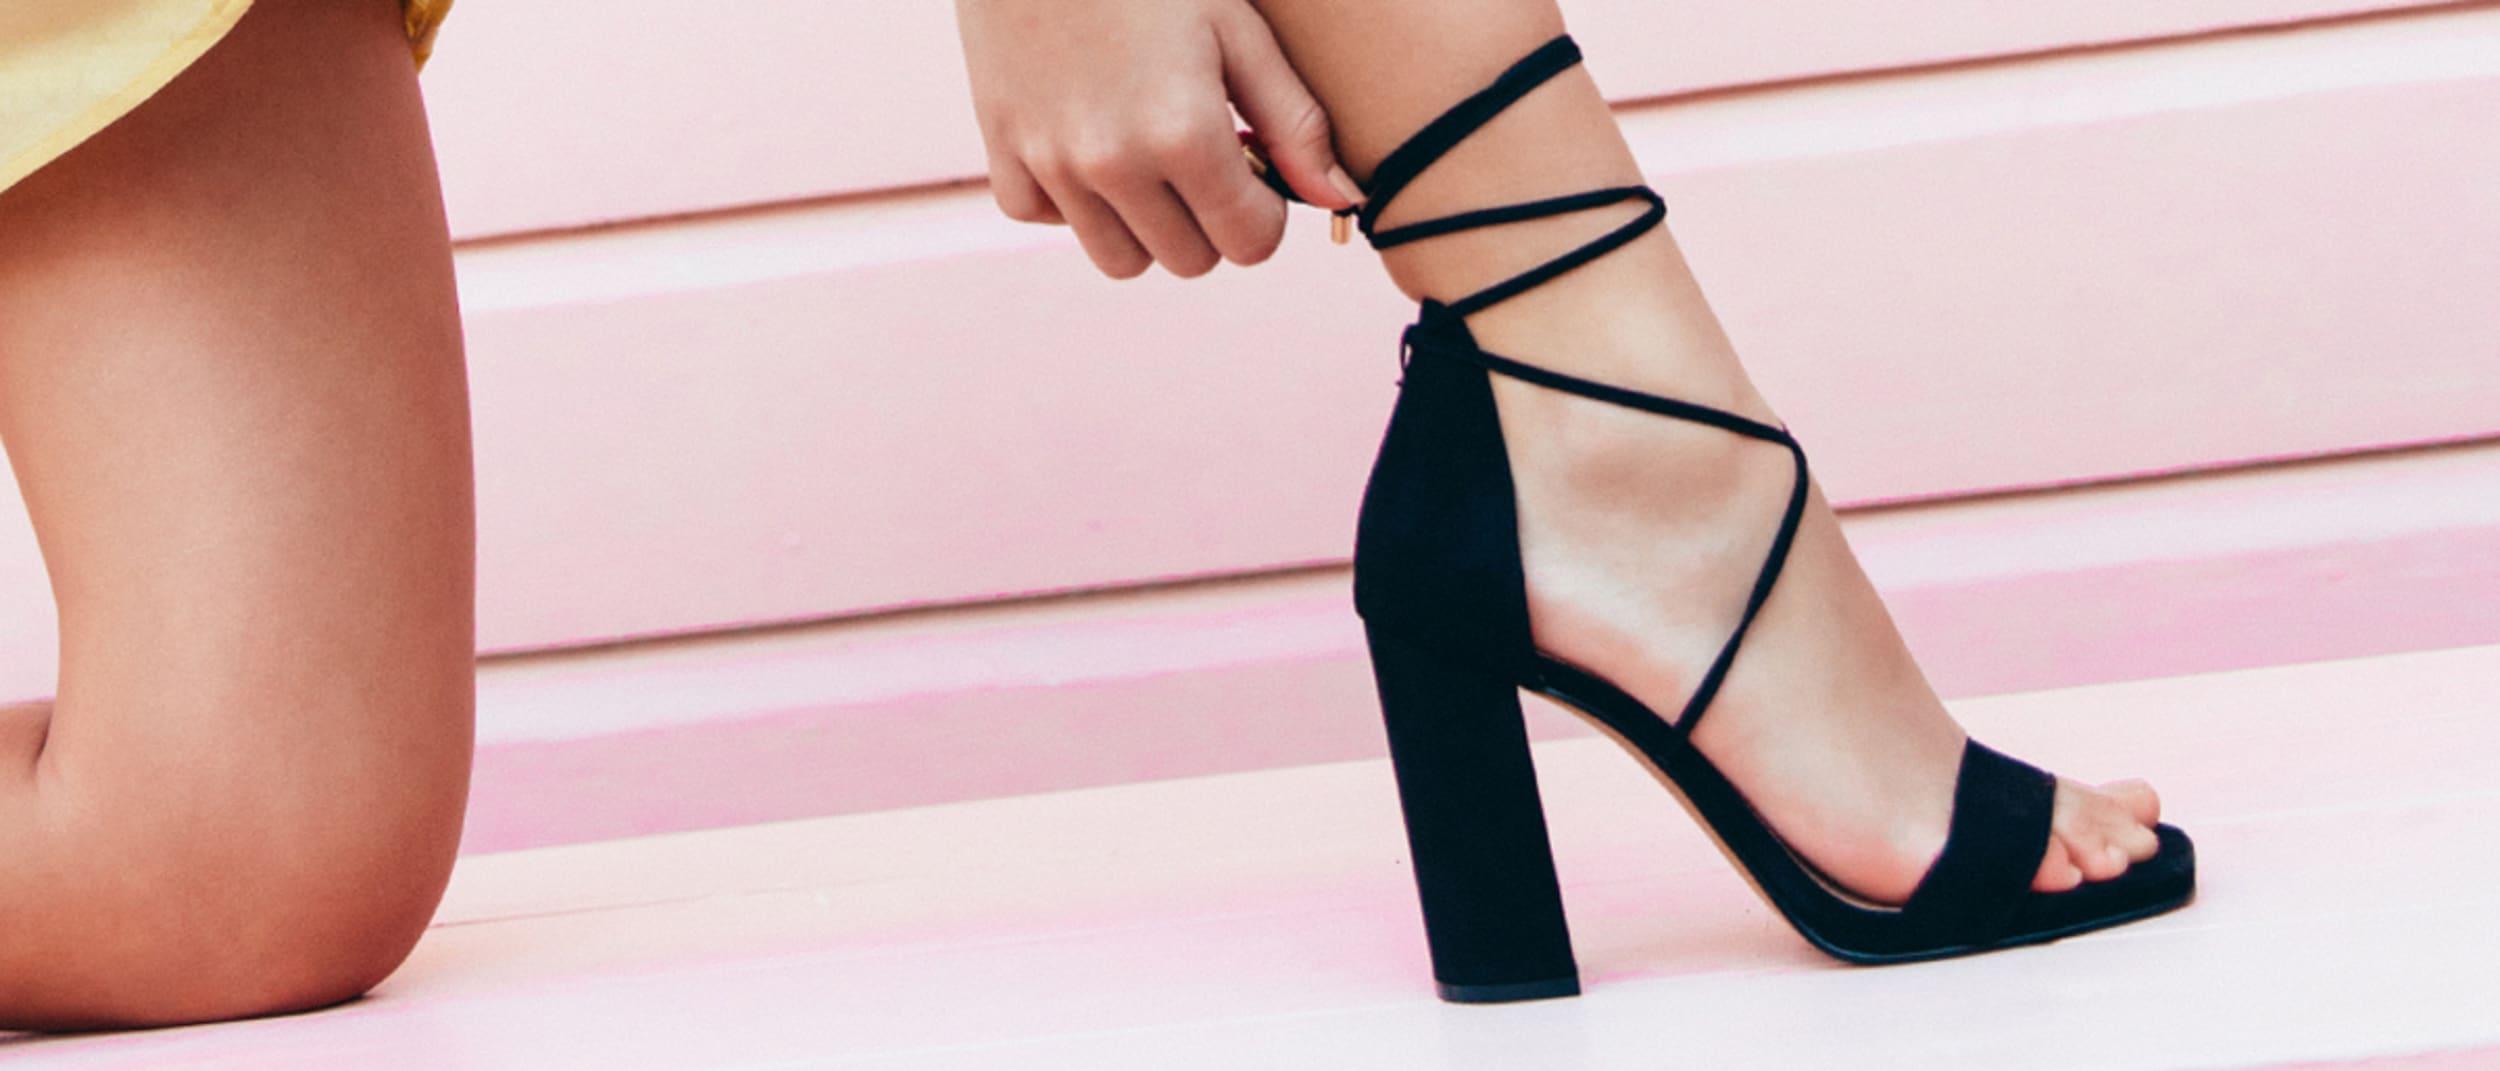 New season styles at Famous Footwear